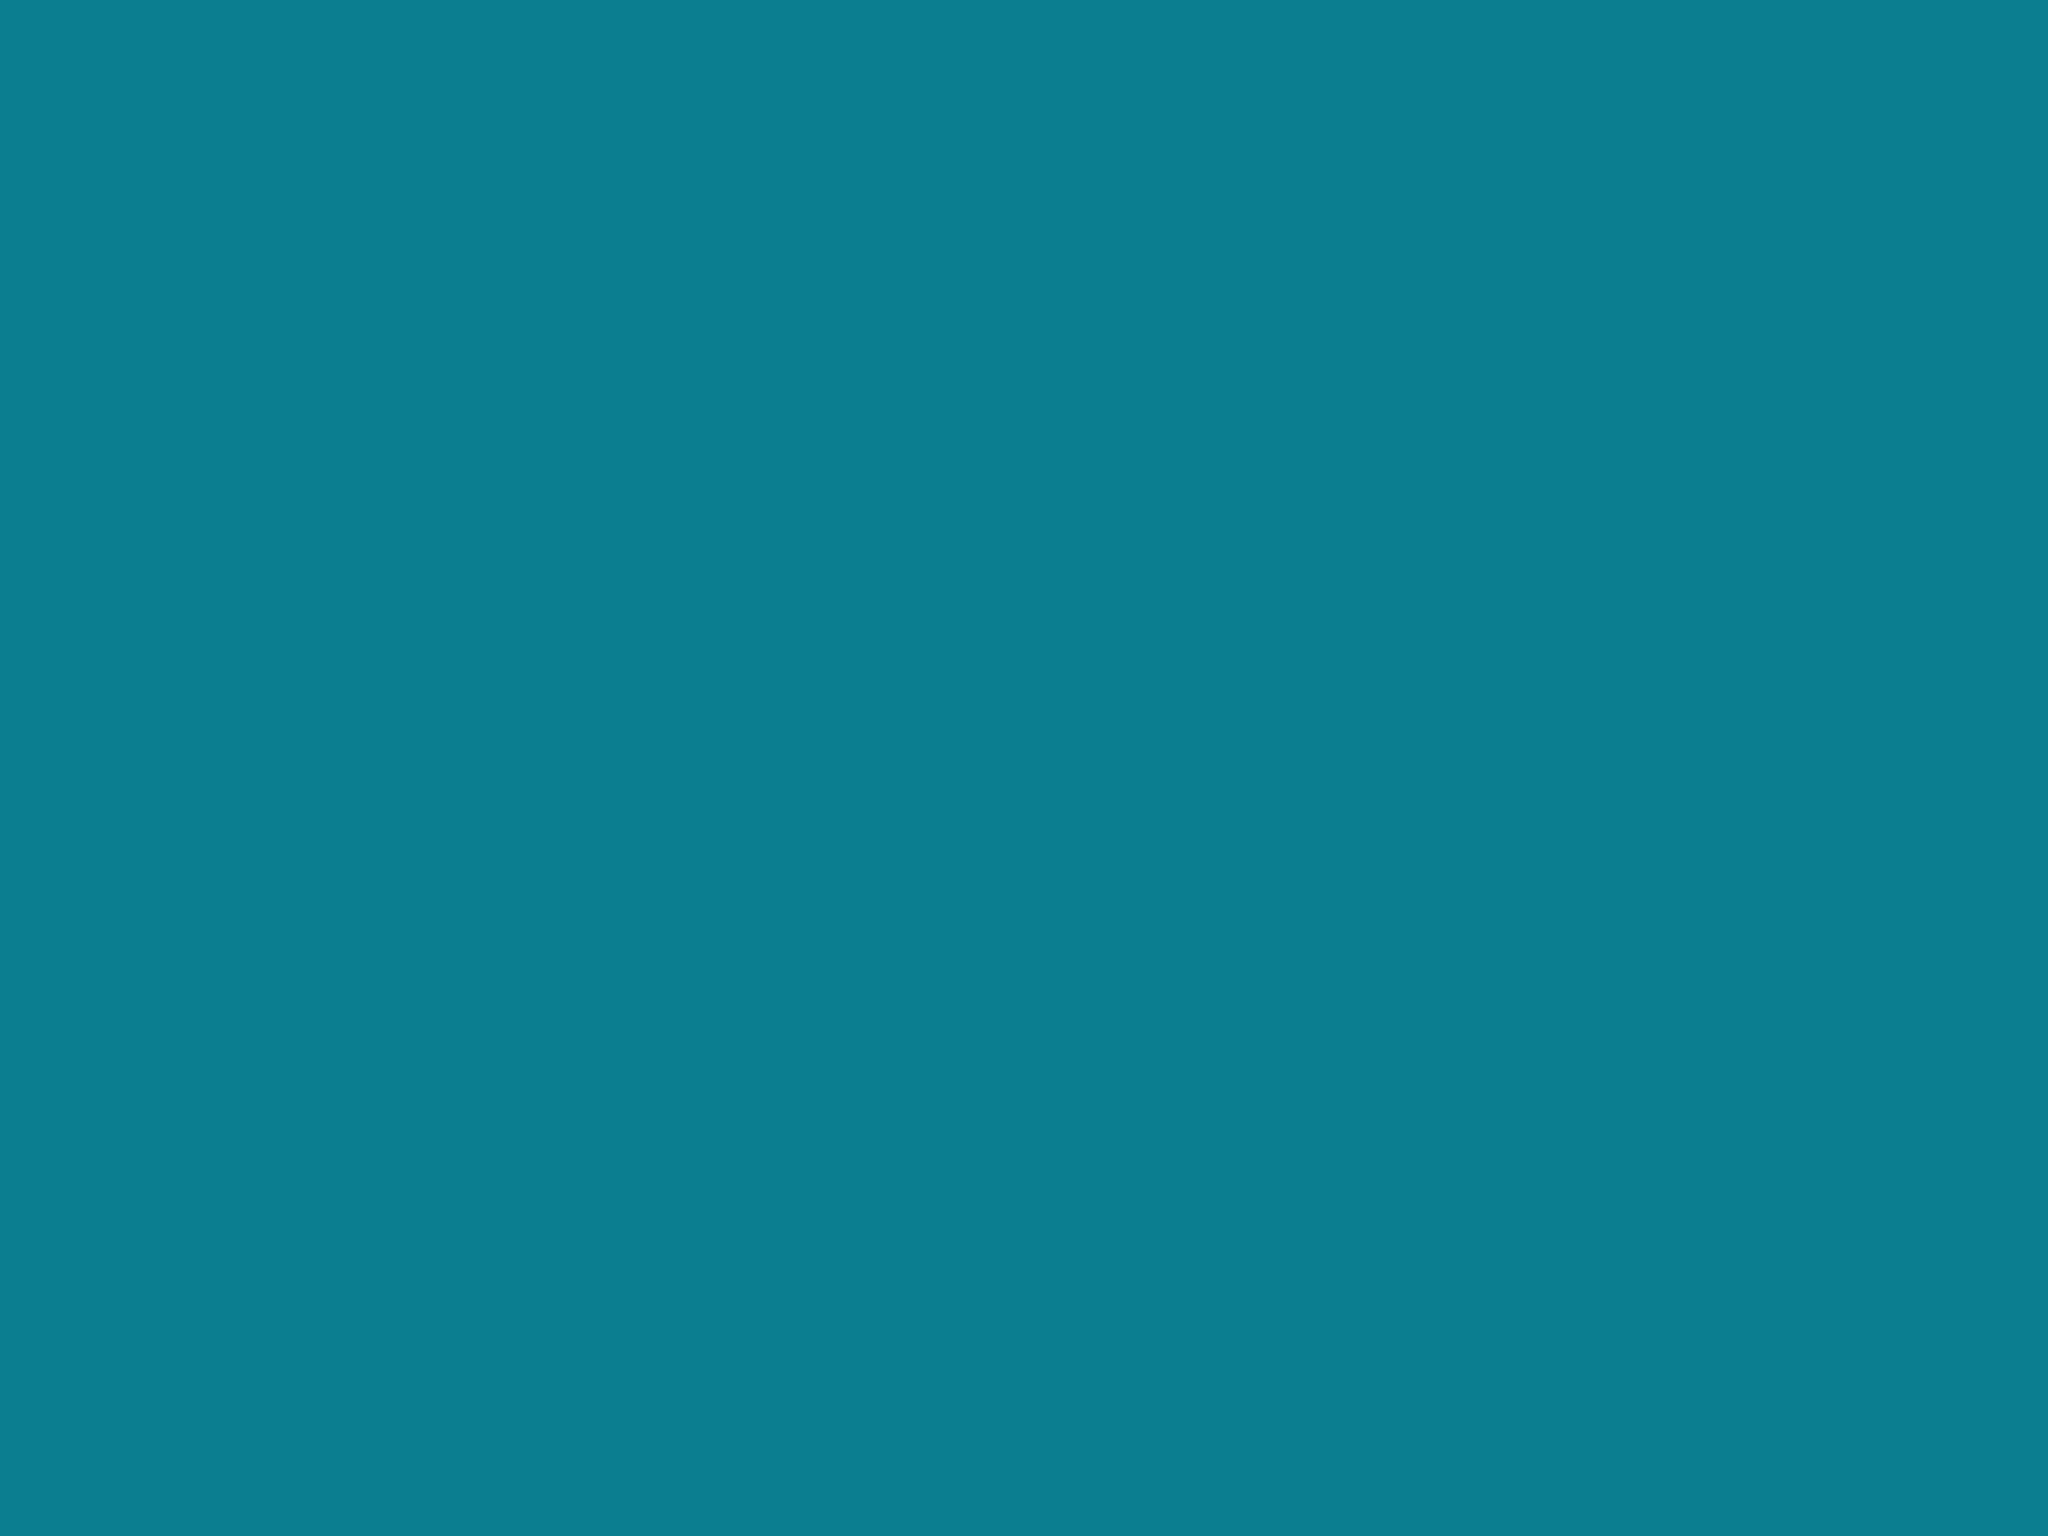 2048x1536 Metallic Seaweed Solid Color Background